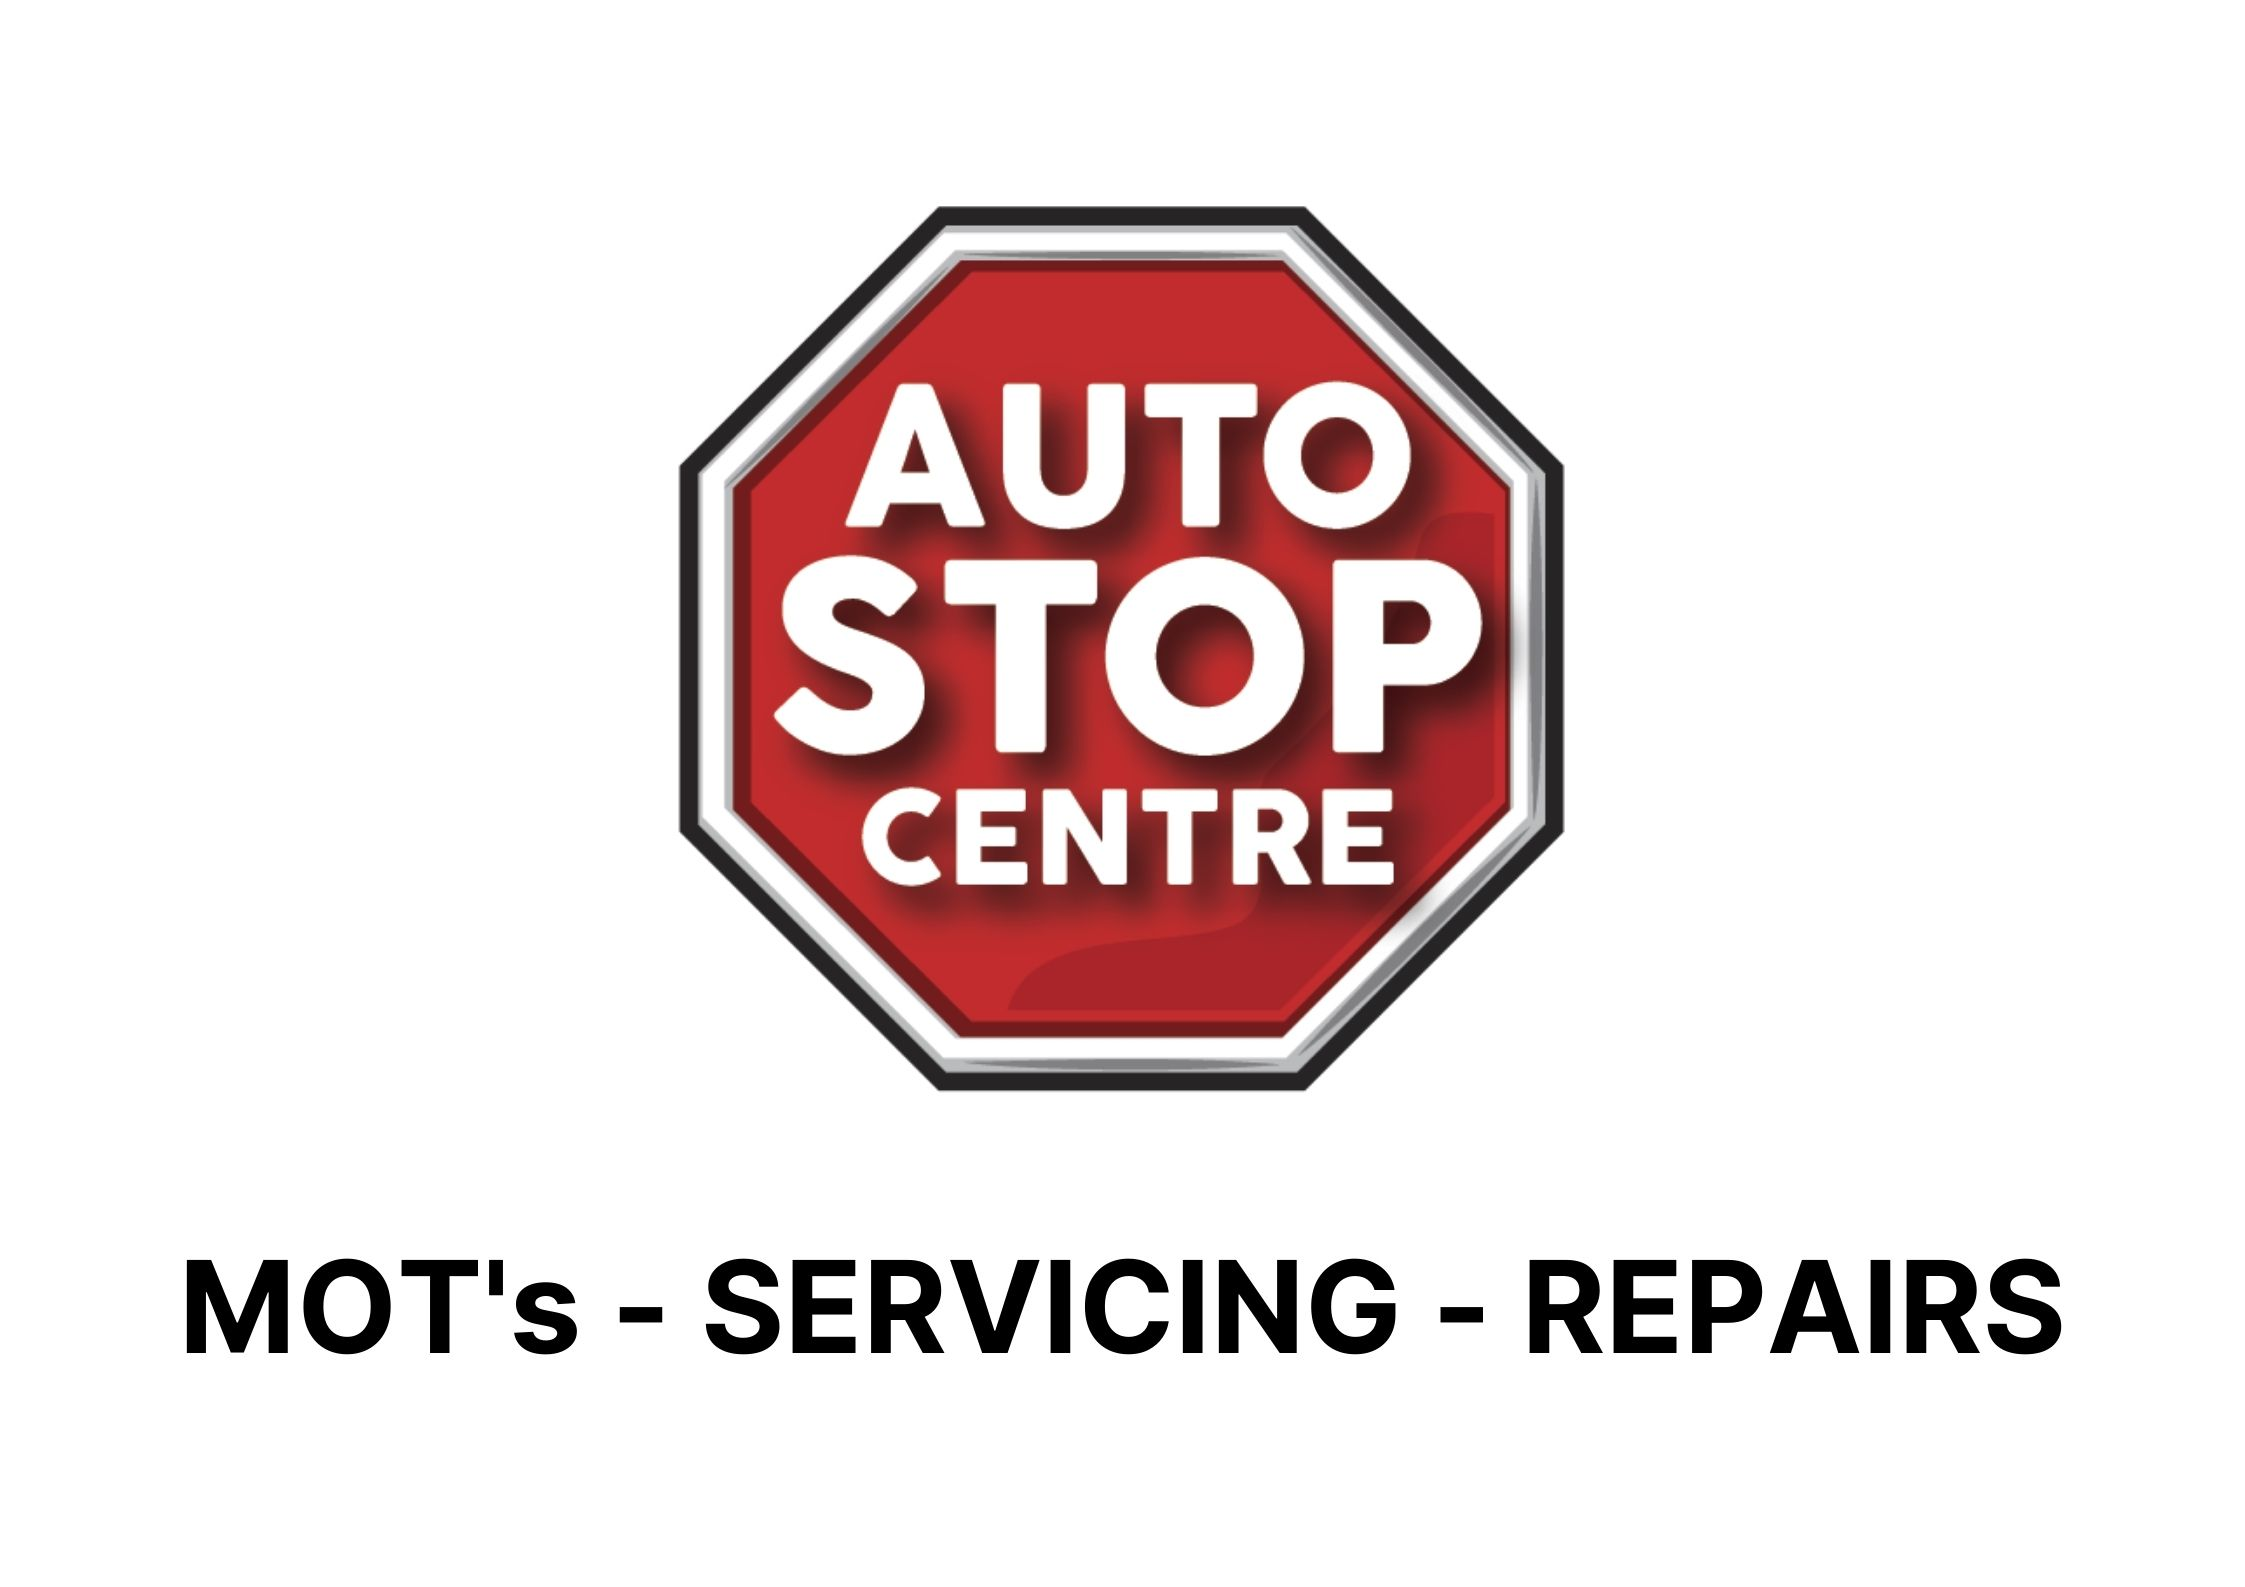 MOT's - SERVICING - REPAIRS